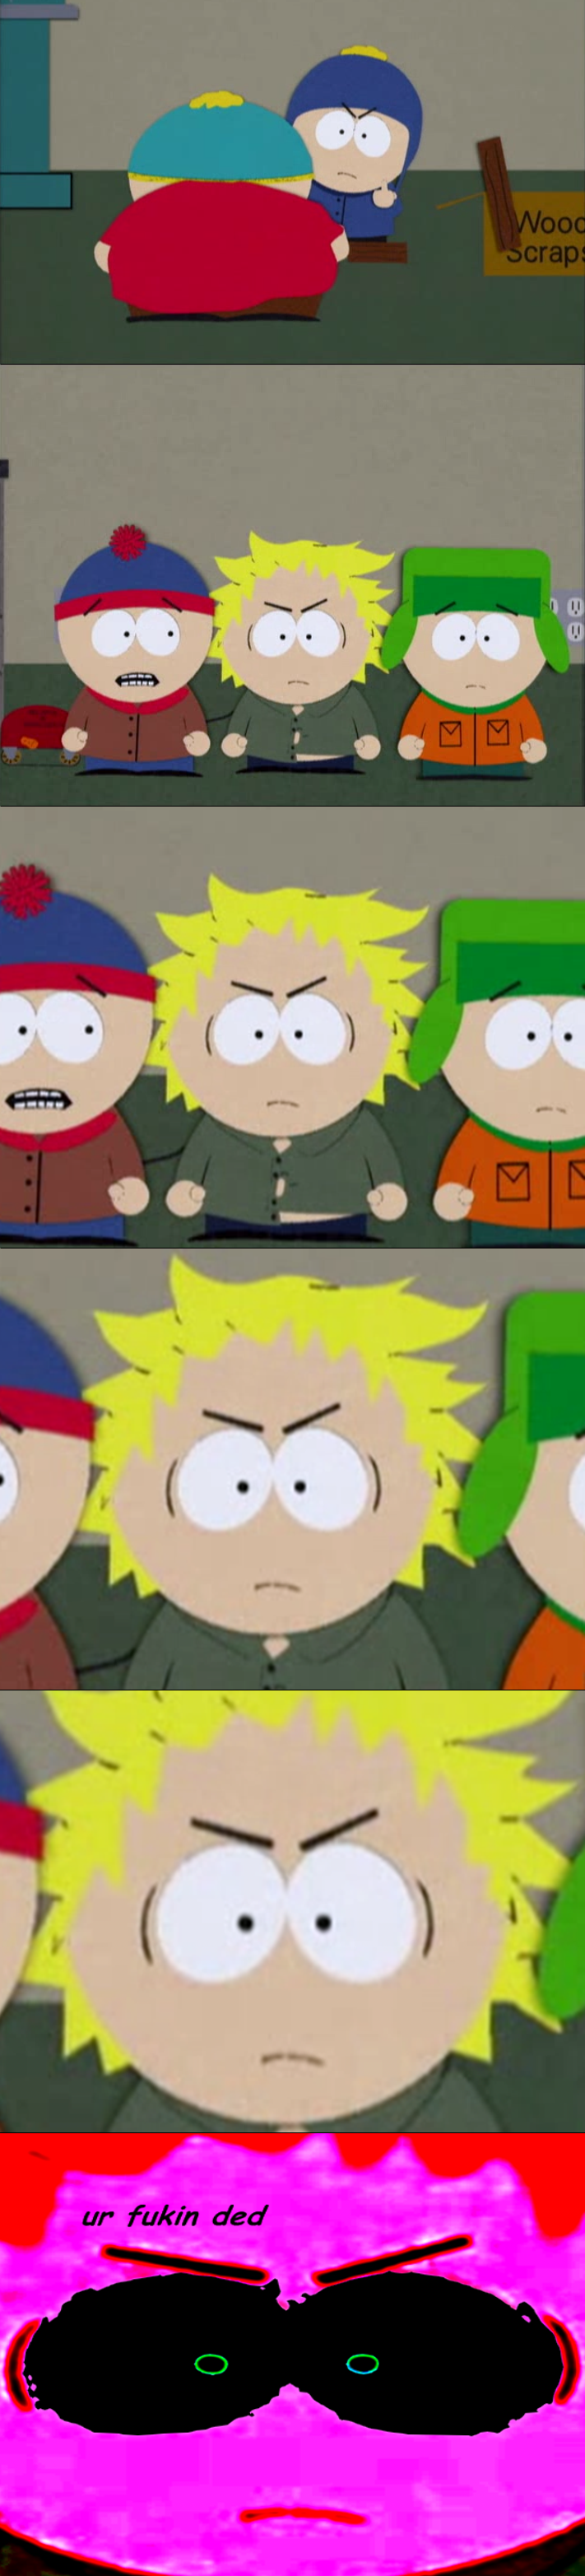 South Park tweek vs. craig